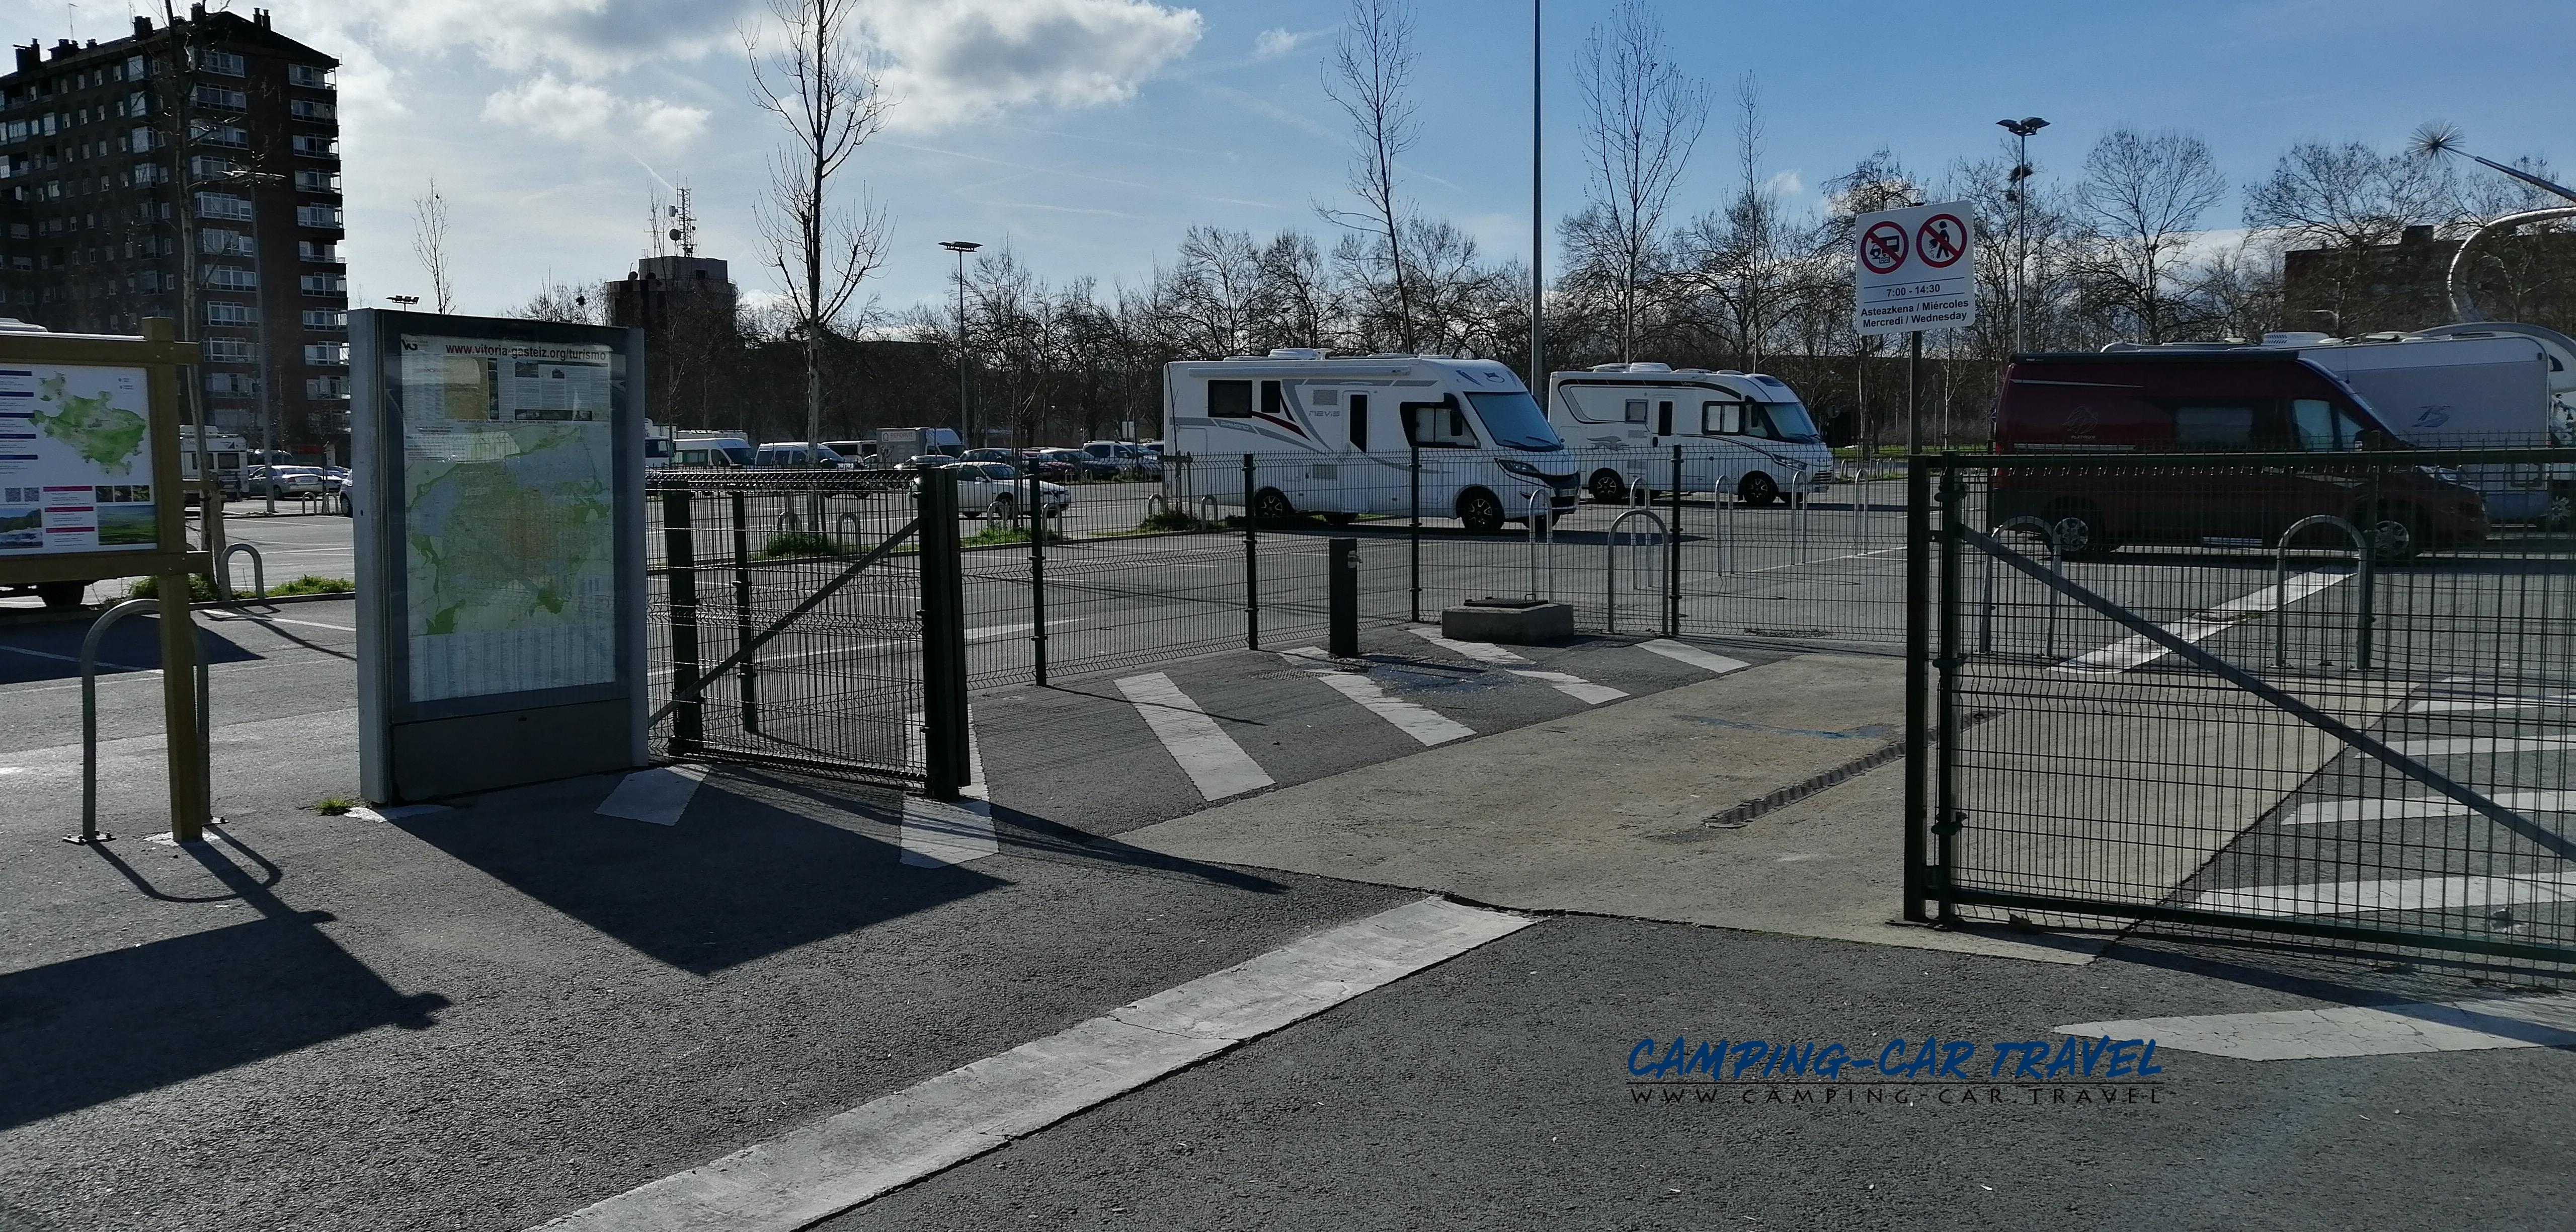 aire services camping car Vitoria Gasteiz Espagne Spain